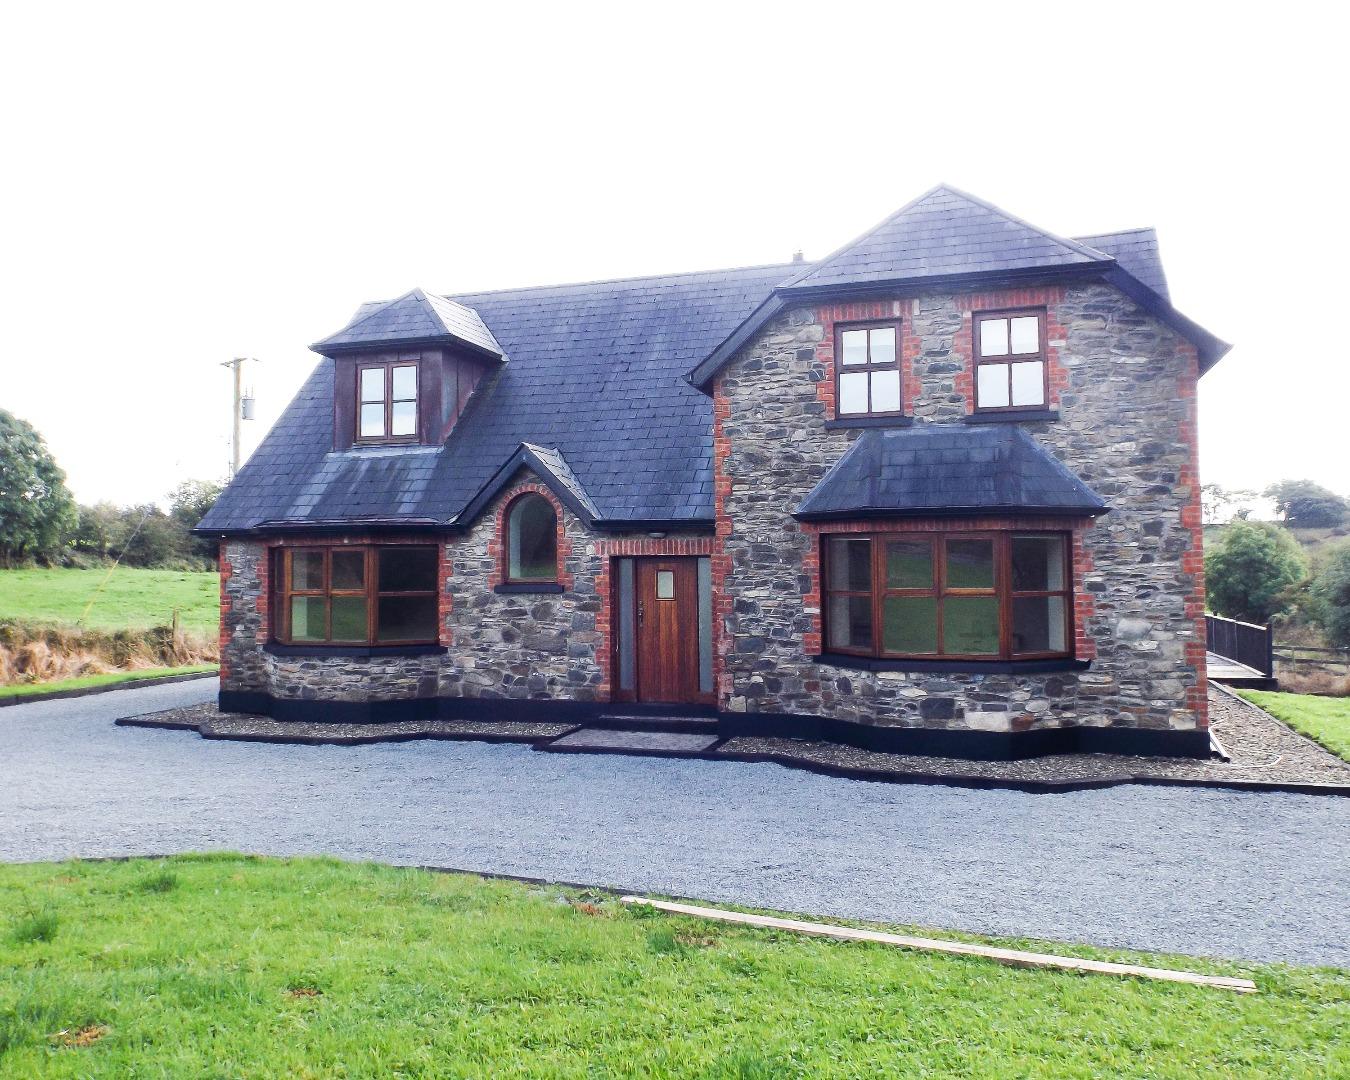 4 bed House for sale on Coravelis, Bailieborough, Co. Cavan - Property Image 1